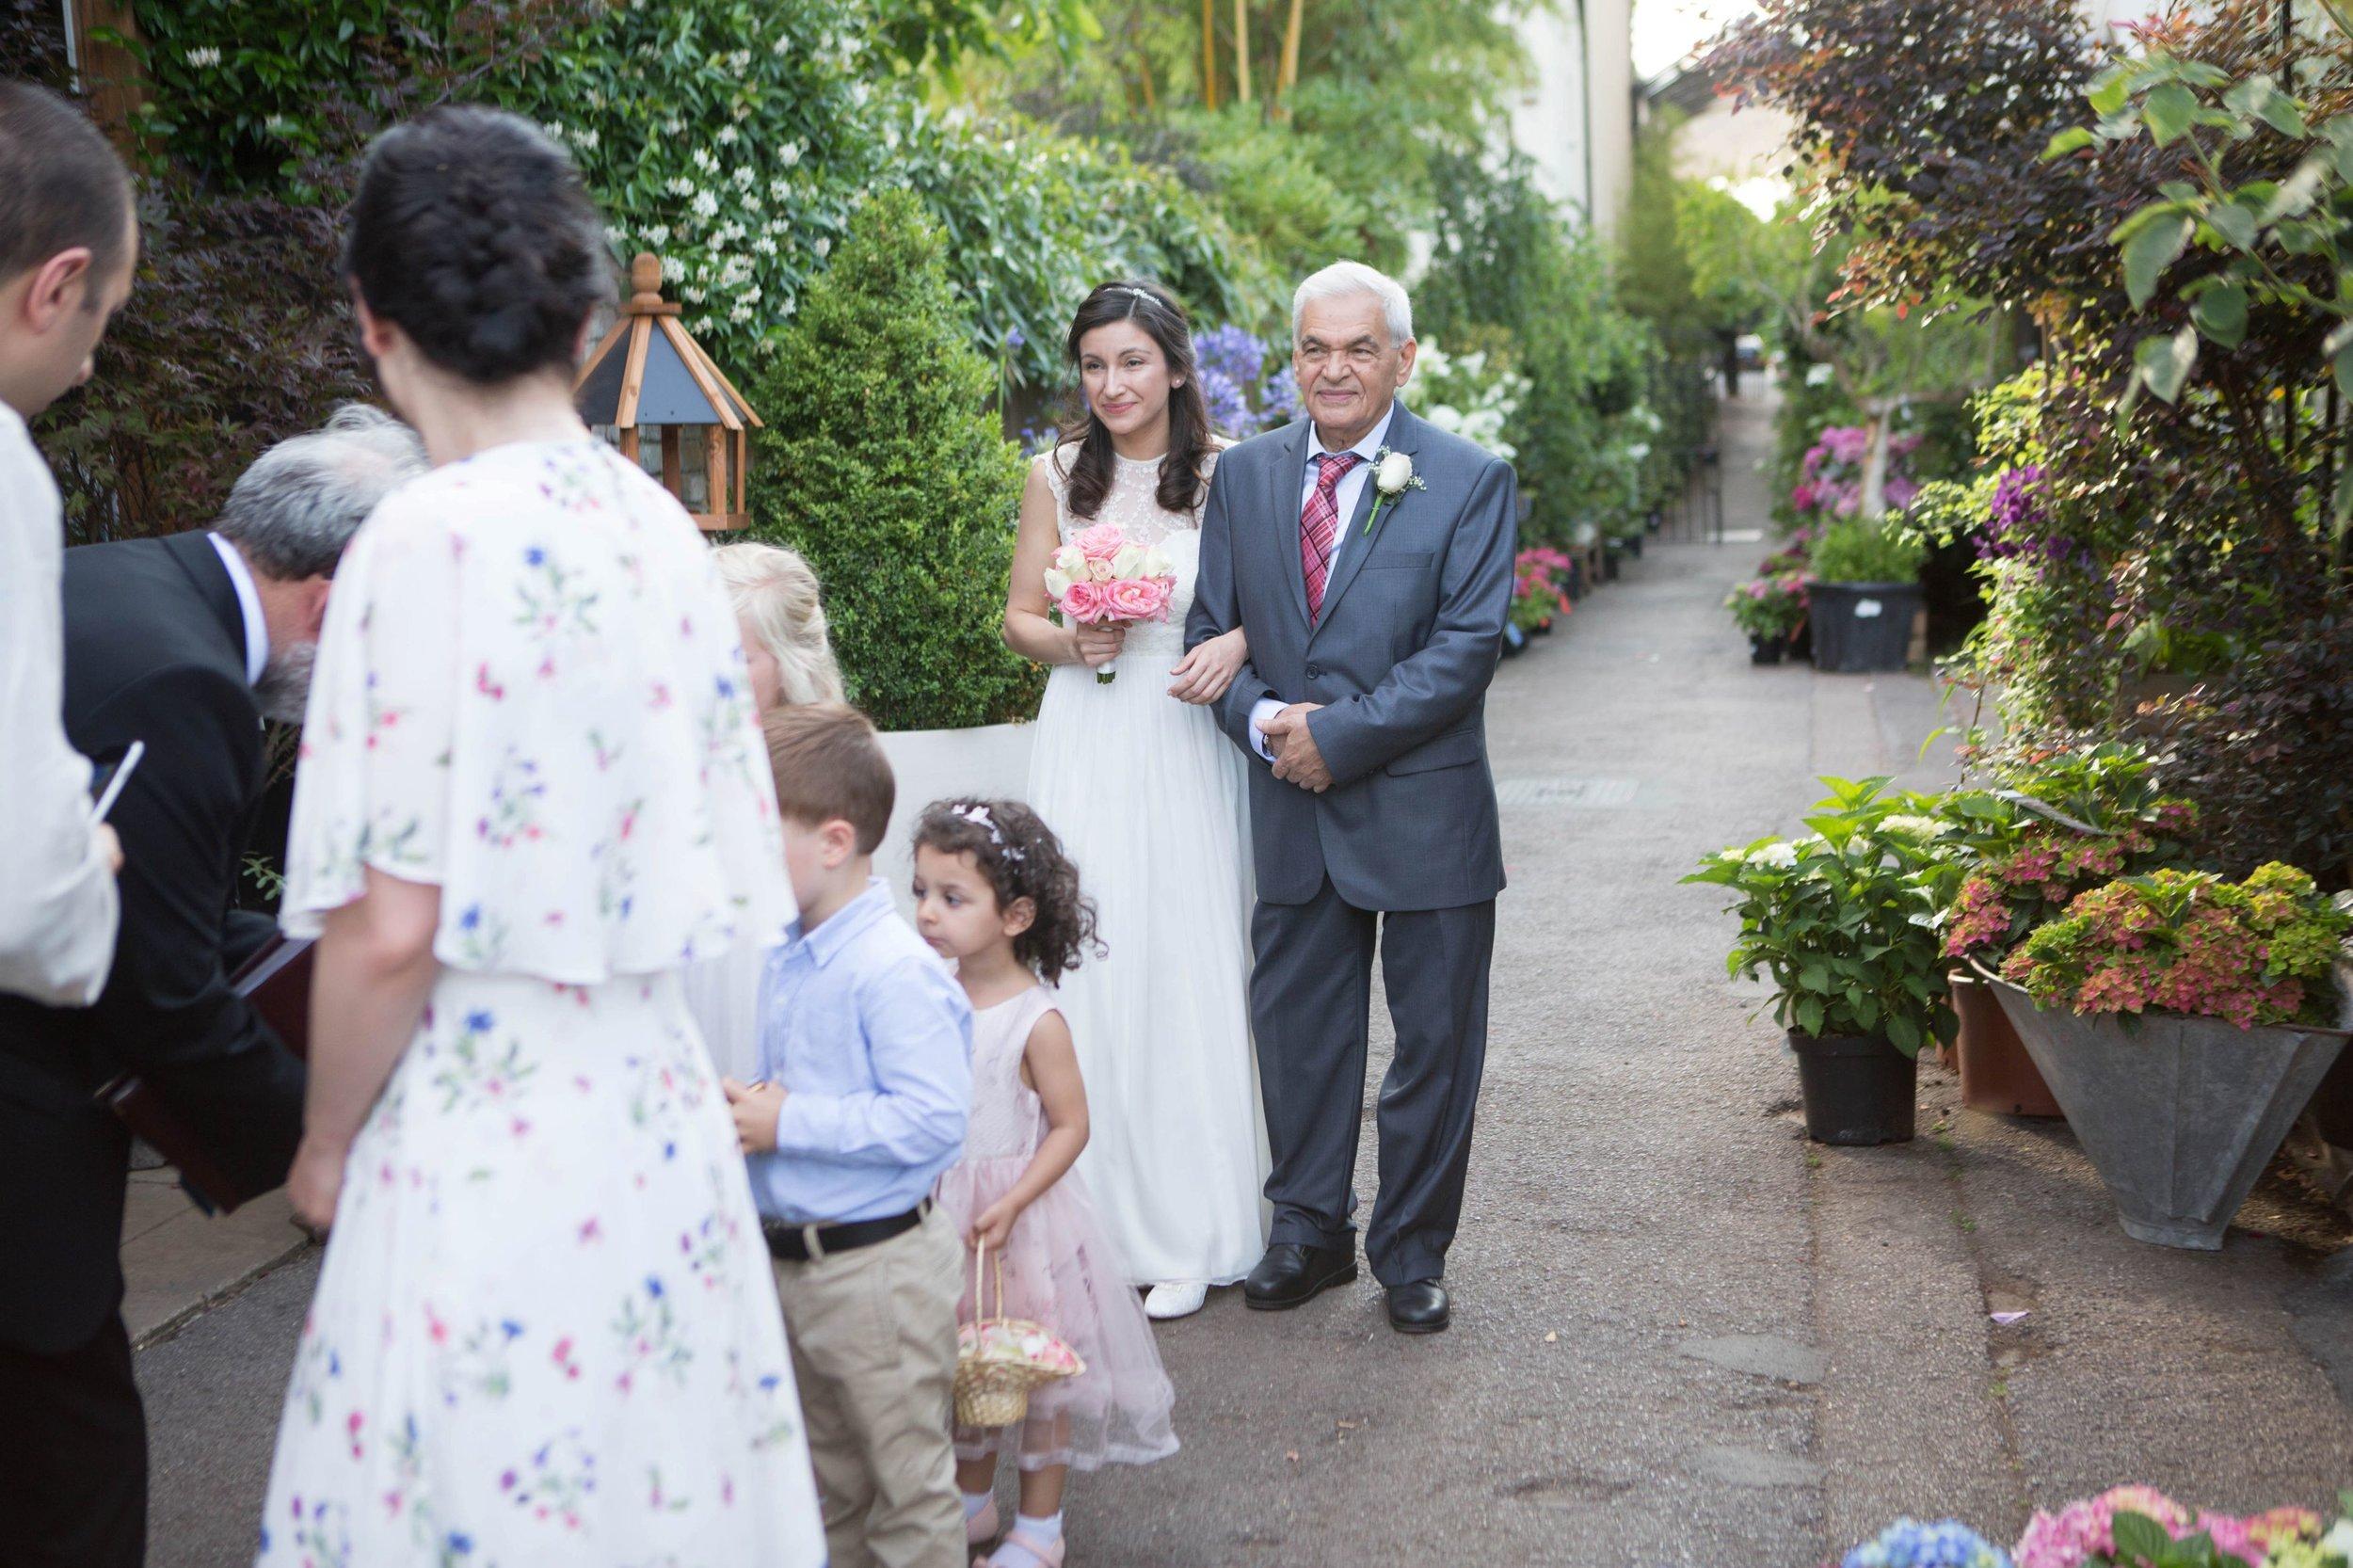 Hulya_&_Ben's_Clifton_Nurseries_London_Wedding_0146.jpg